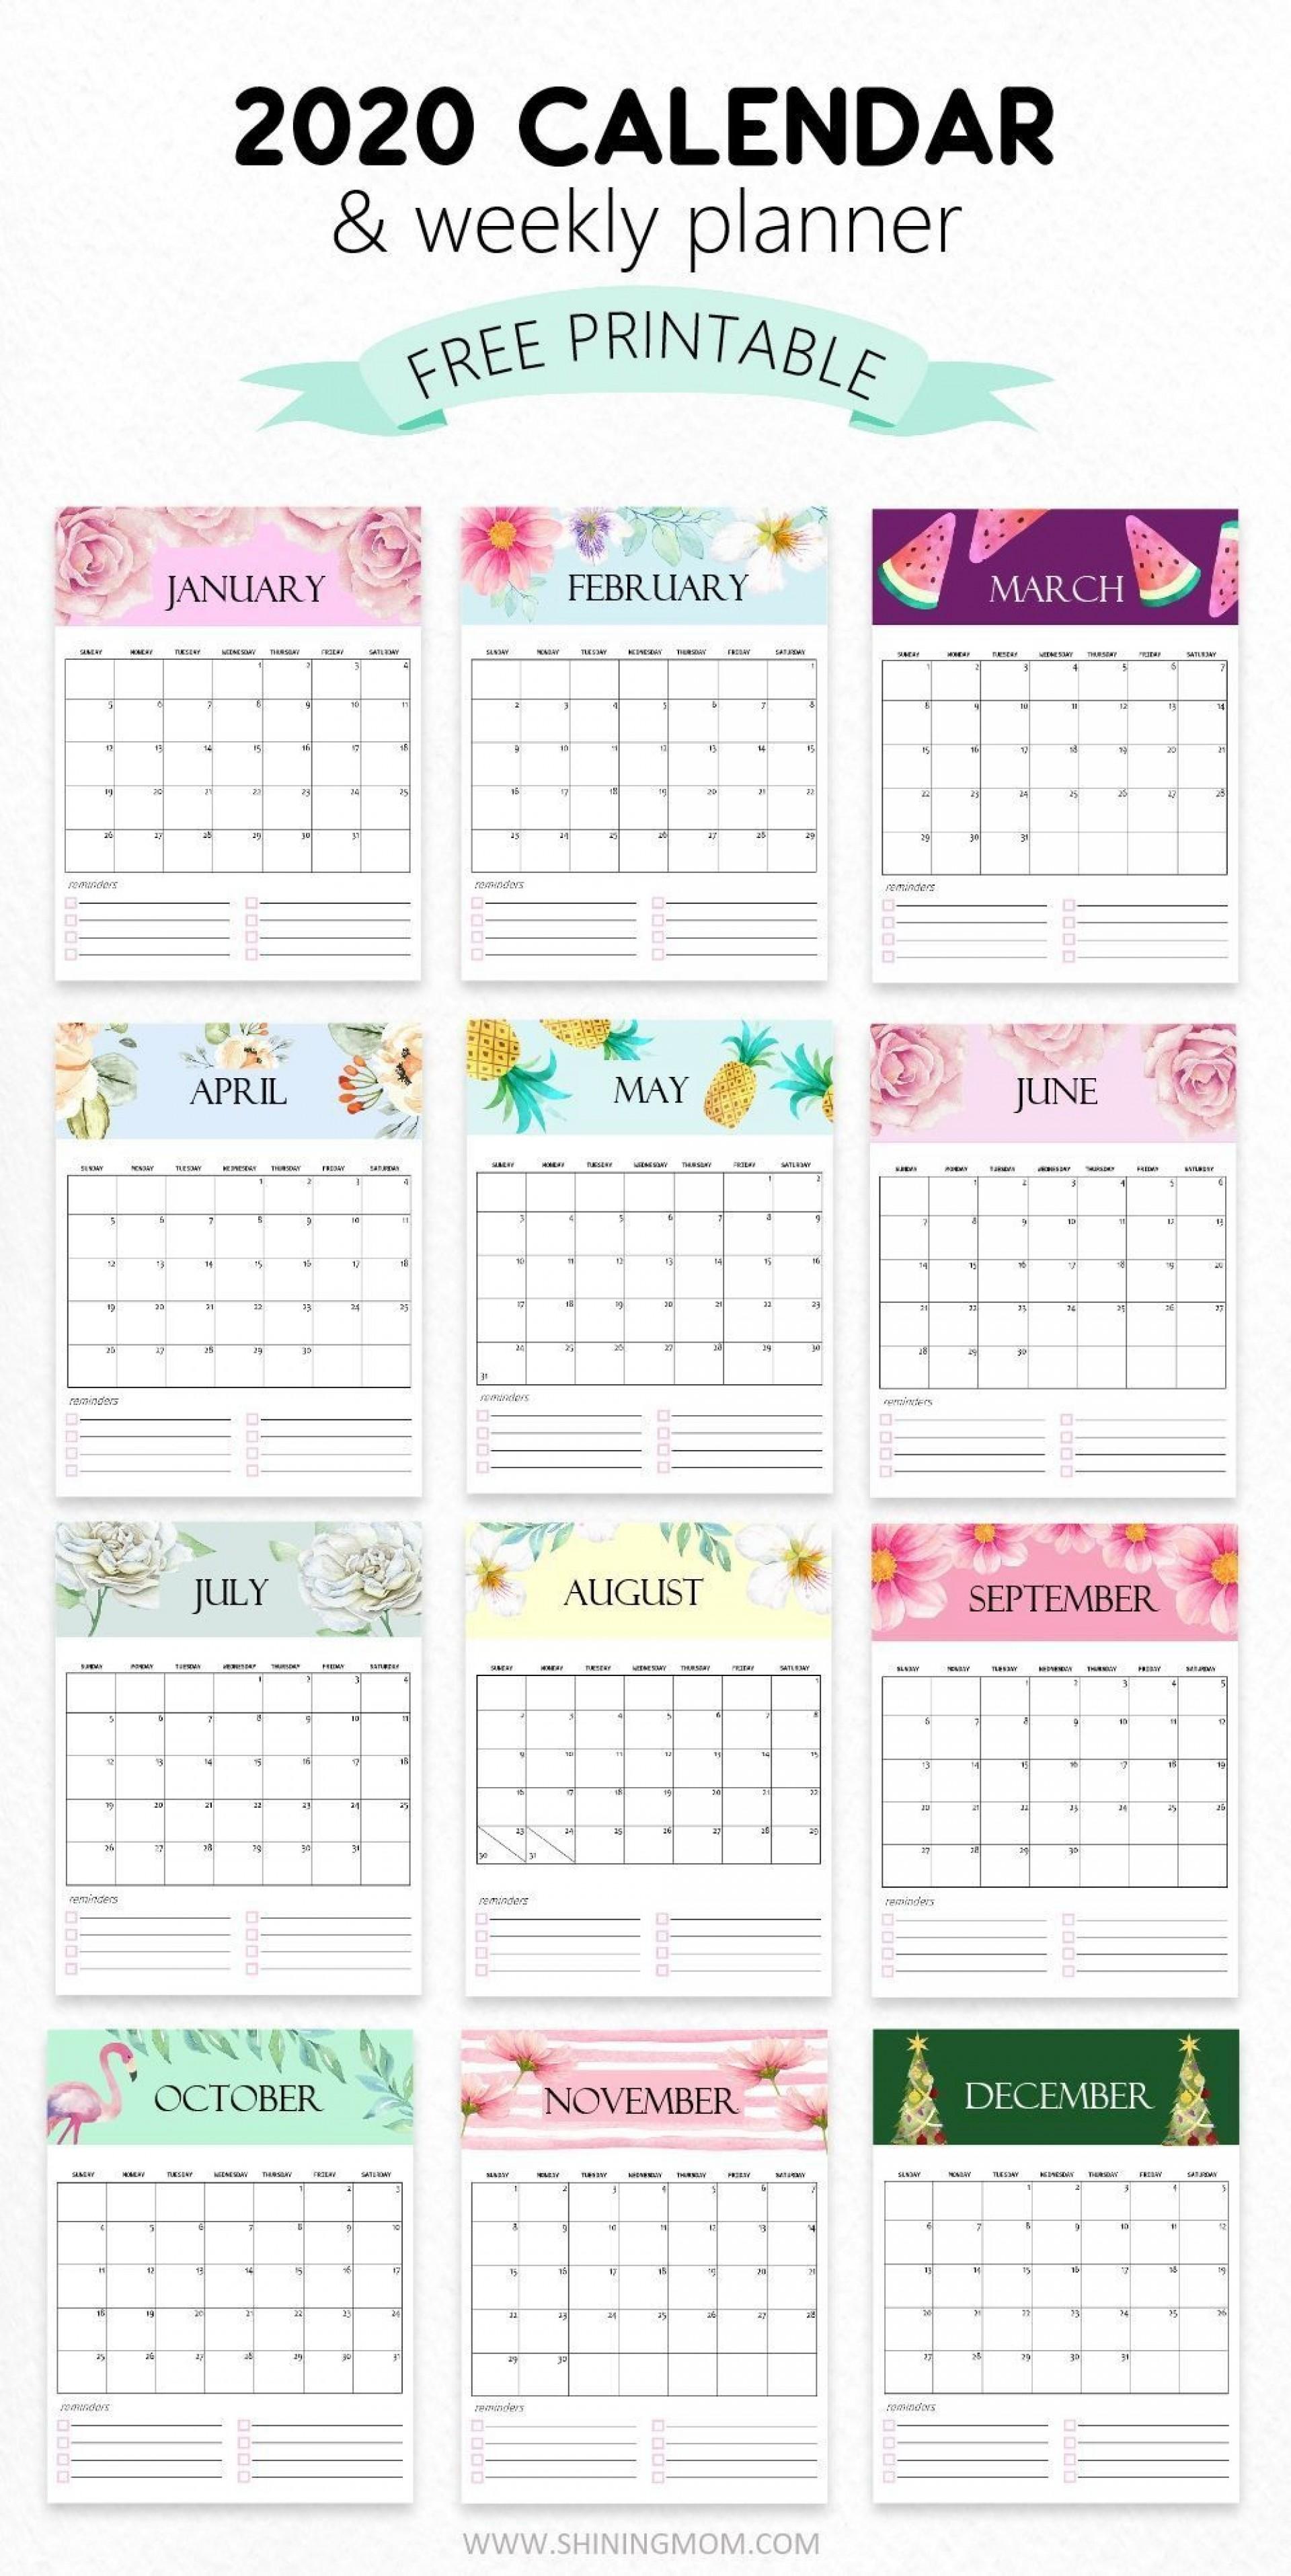 001 Wonderful Google Doc Calendar Template 2020 Inspiration  Drive Sheet Weekly1920